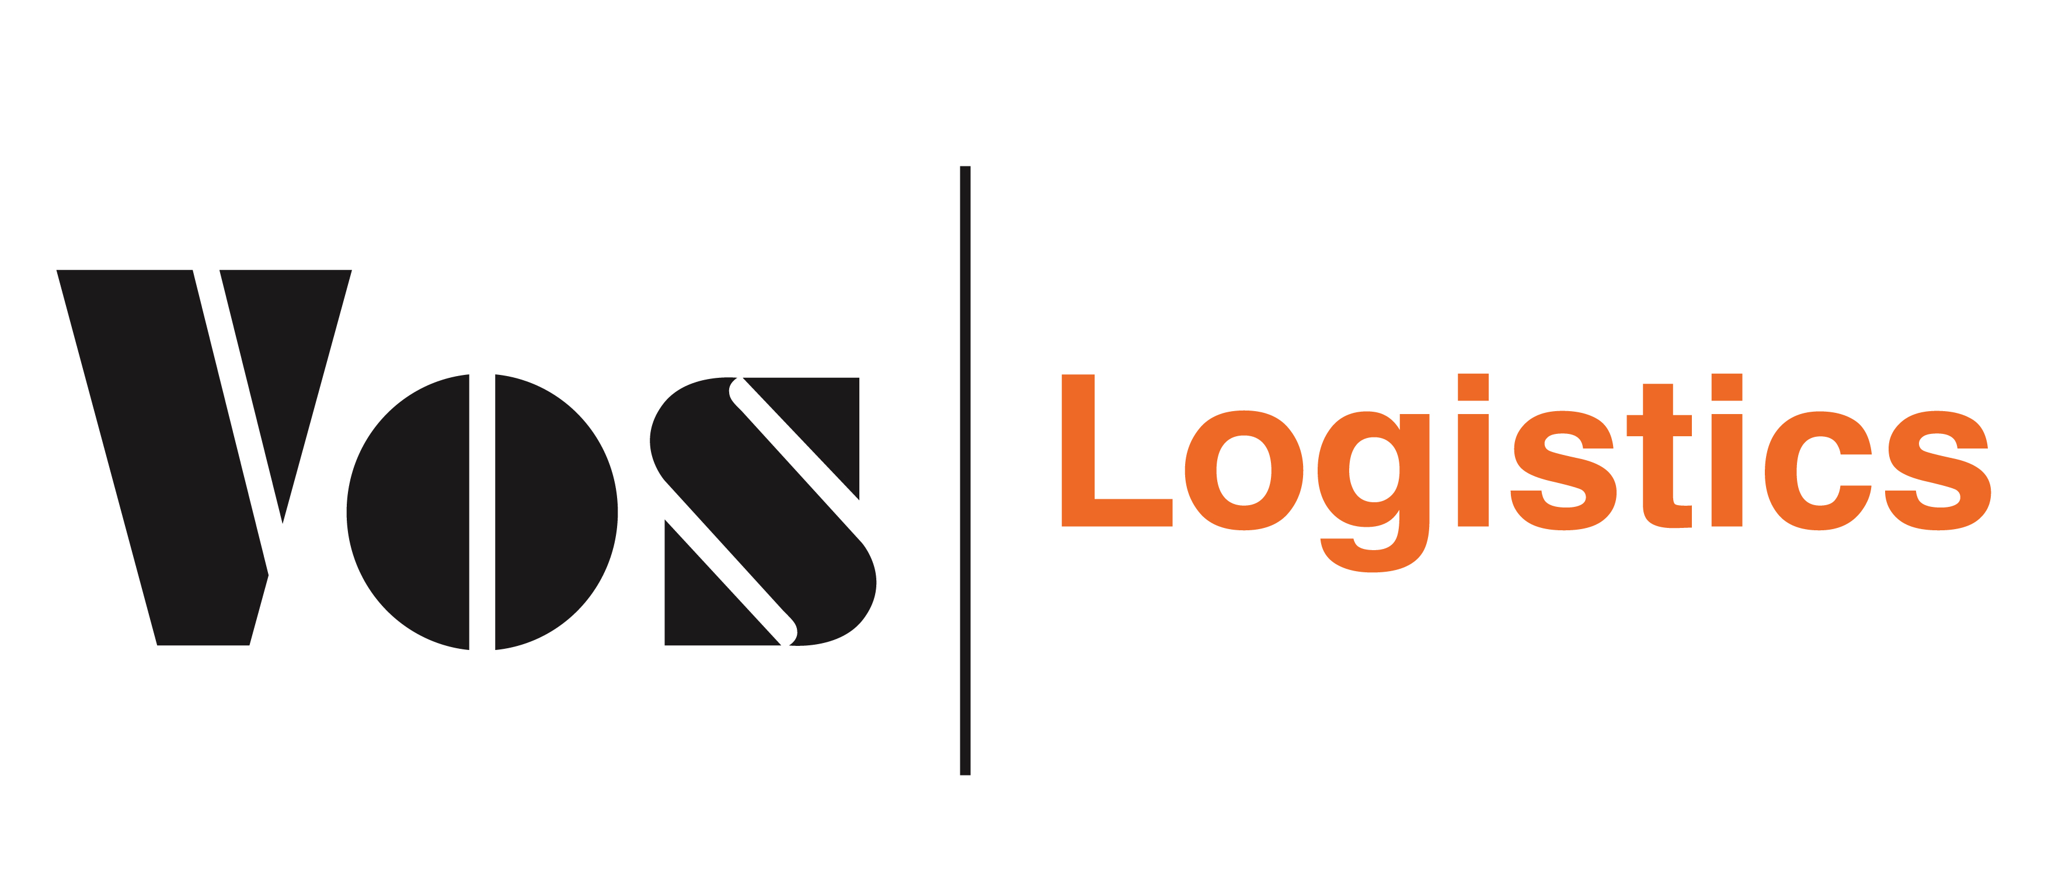 Logo - Vos Logistics - ZoomWorks - JPG